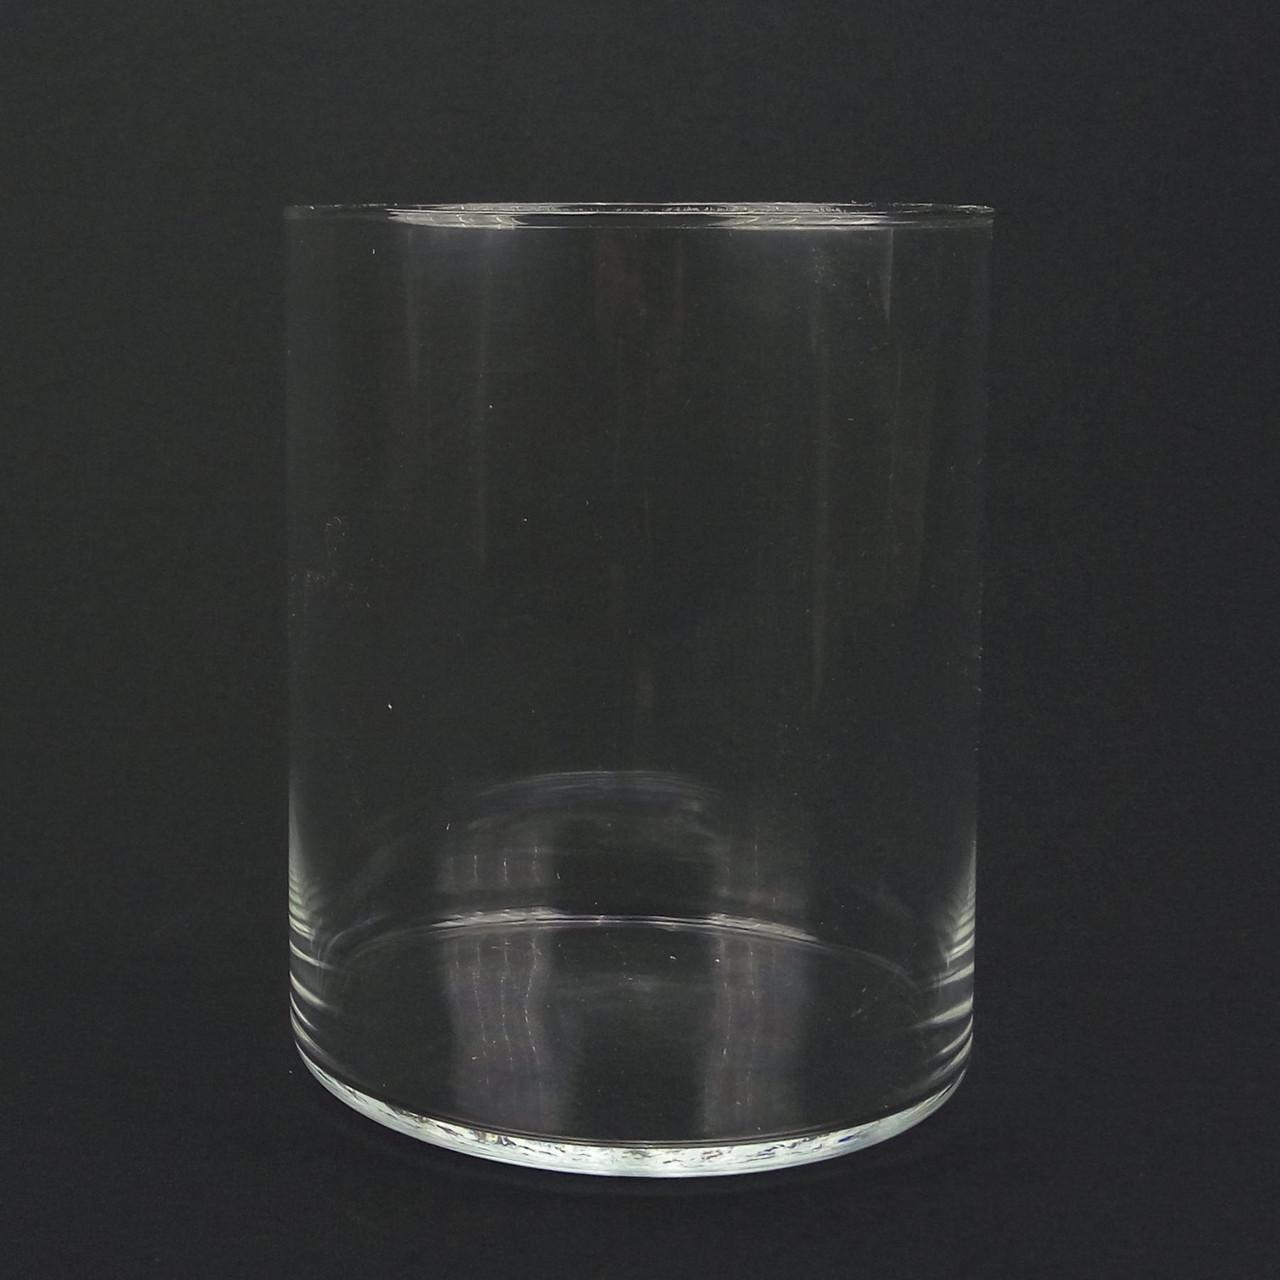 Ваза h 20 см, Ø 16 см, колба